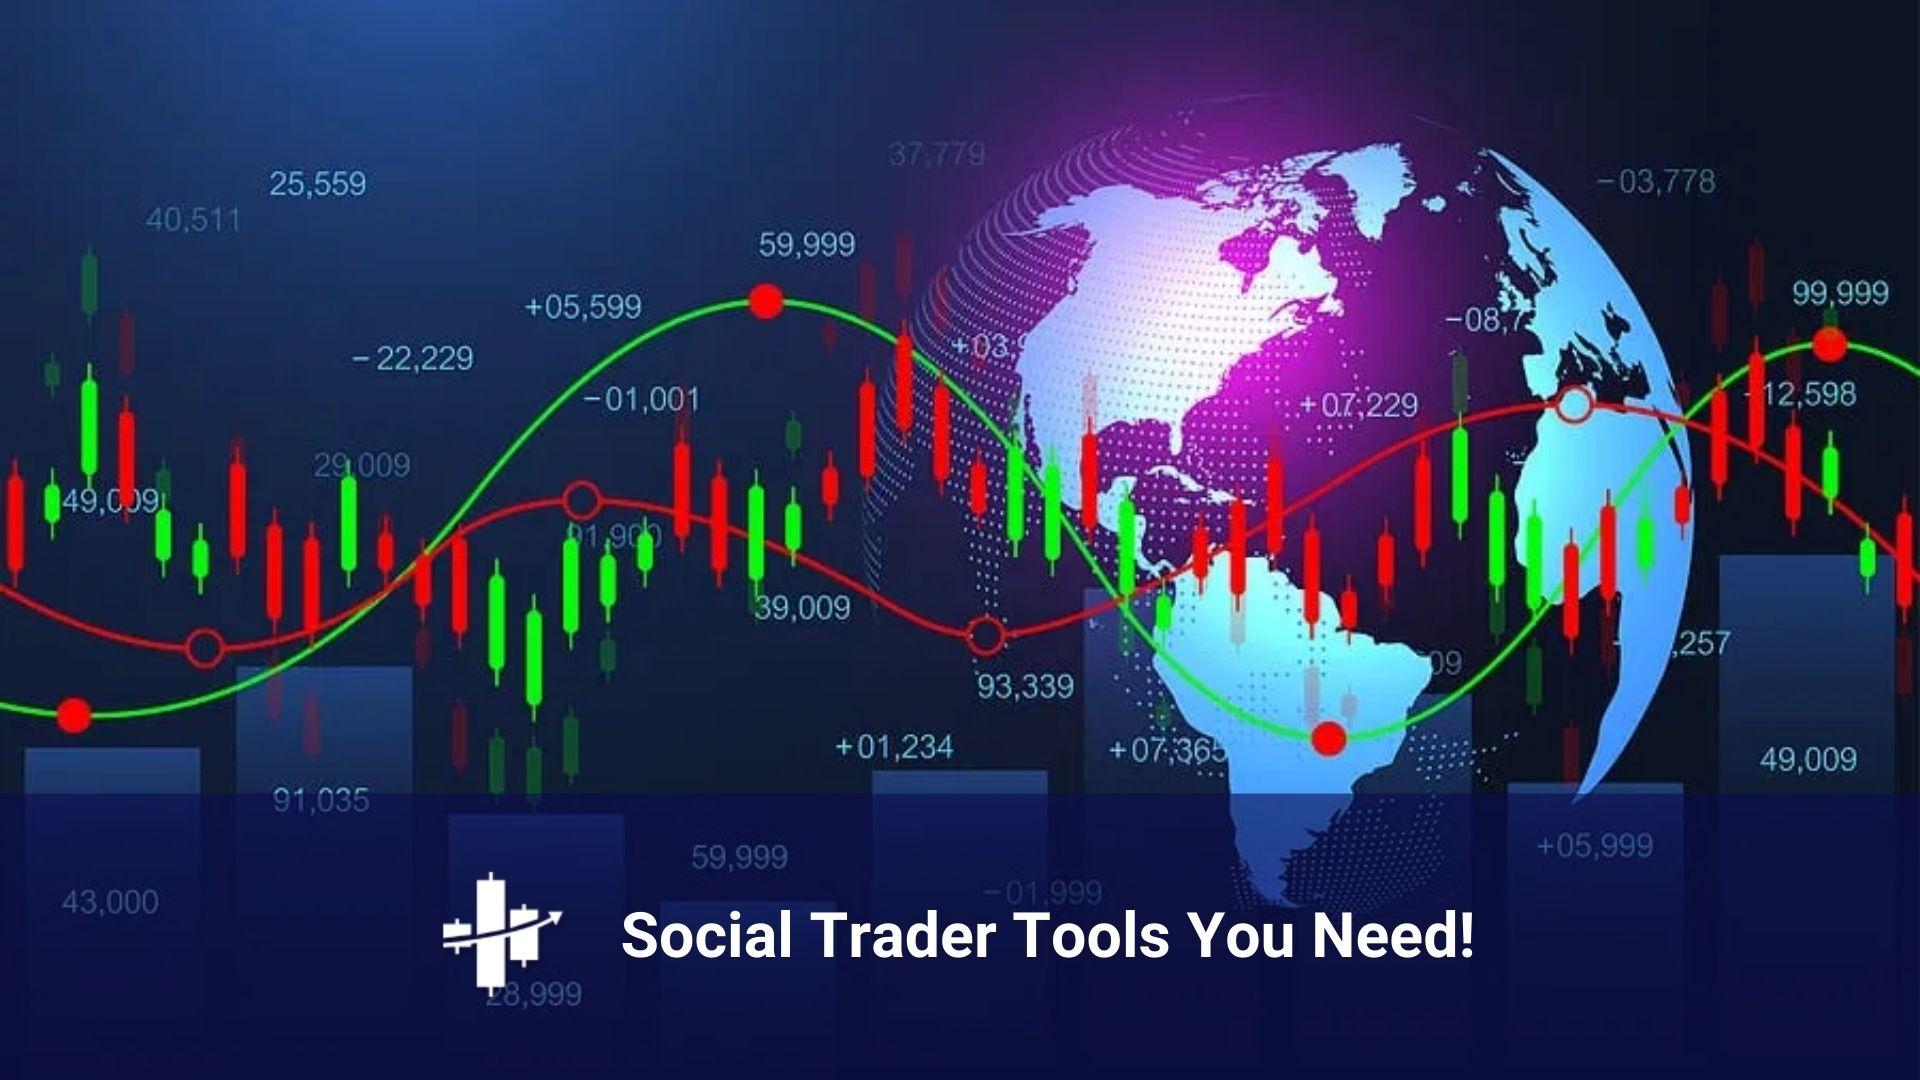 Social Trader Tools